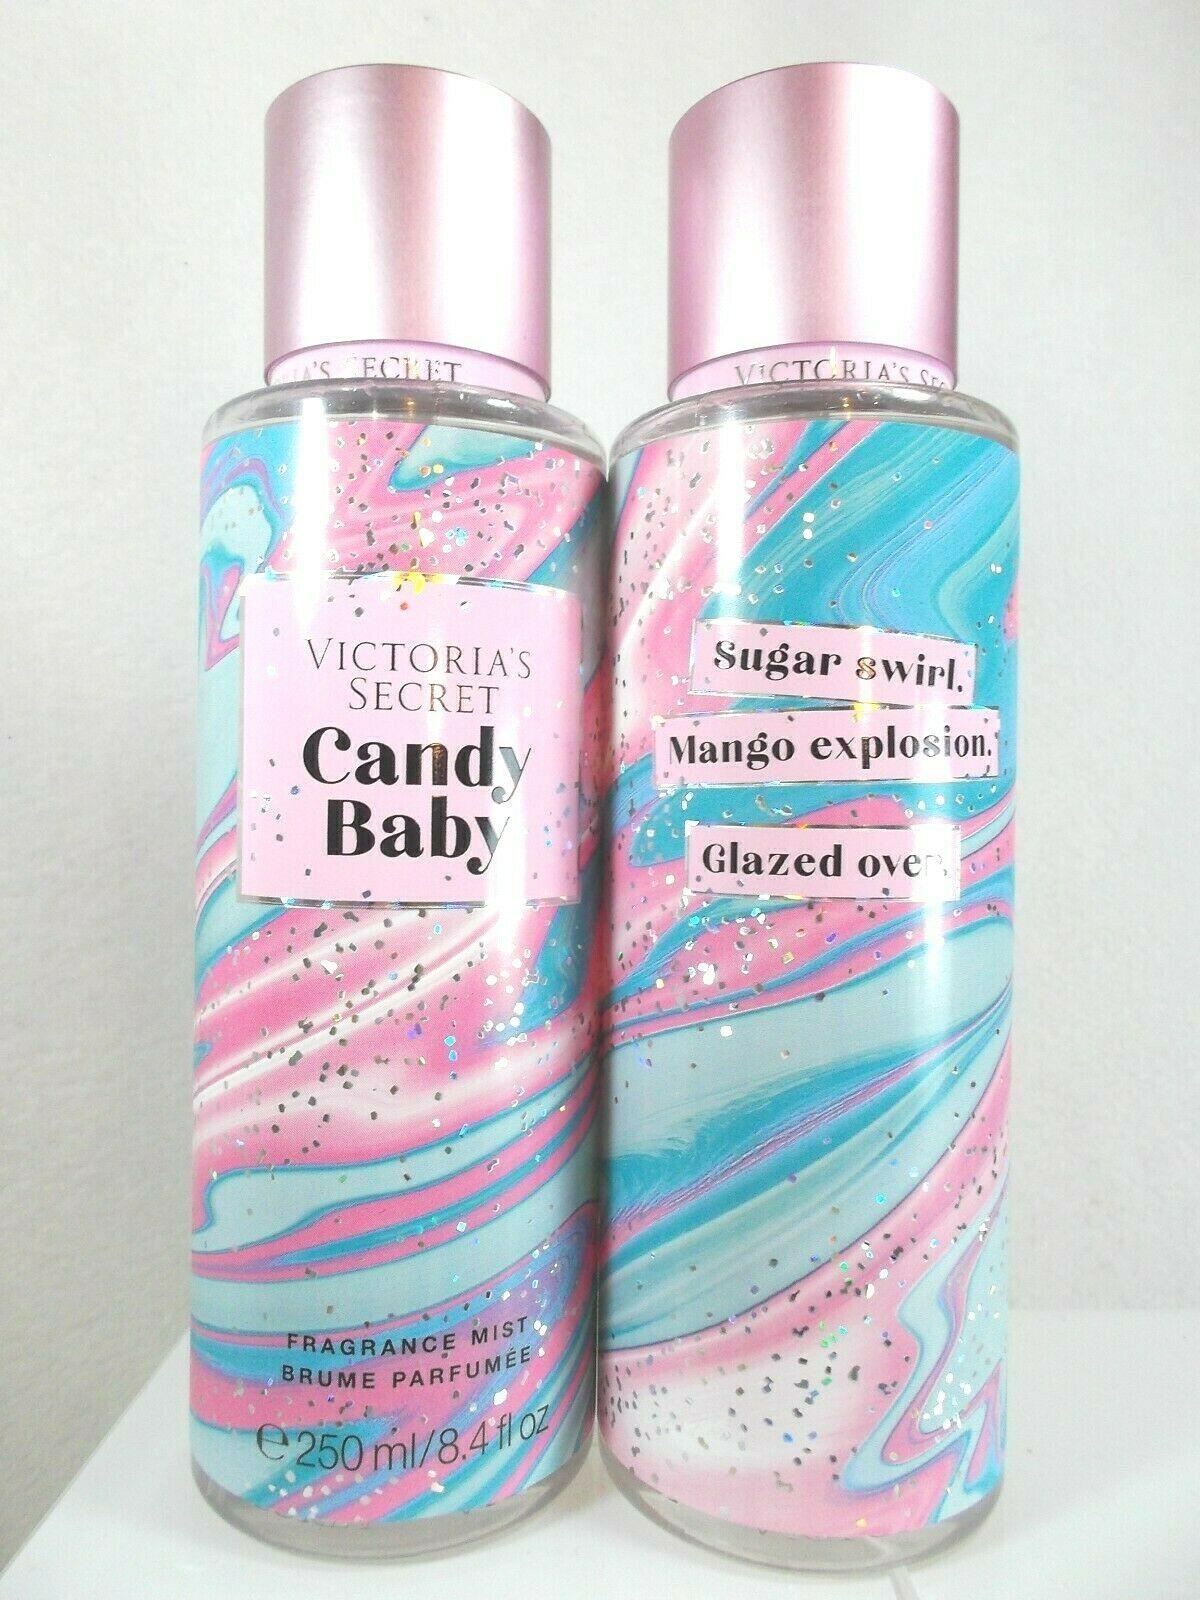 2 Victoria S Secret Candy Baby Fragrance Mist 8 4 Oz Perfume Body